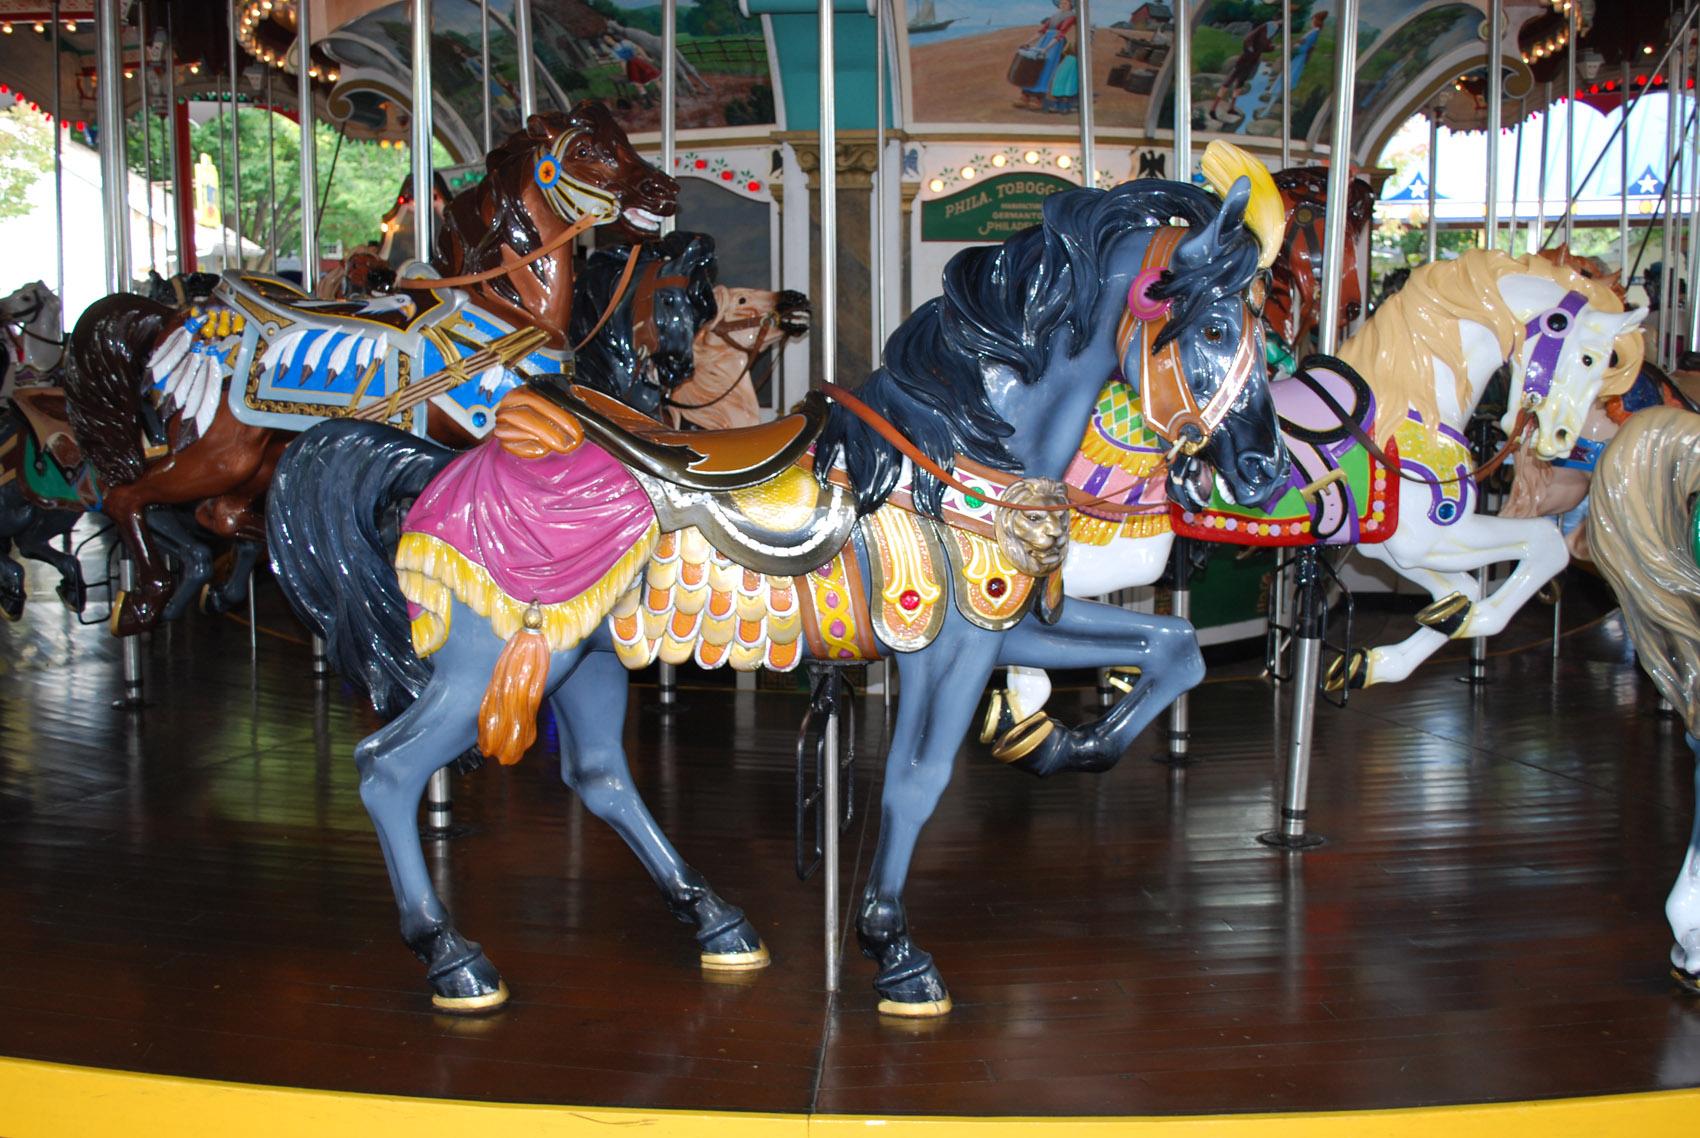 Historic-1919-Hersheypark-PTC-47-carousel-horse-_0324